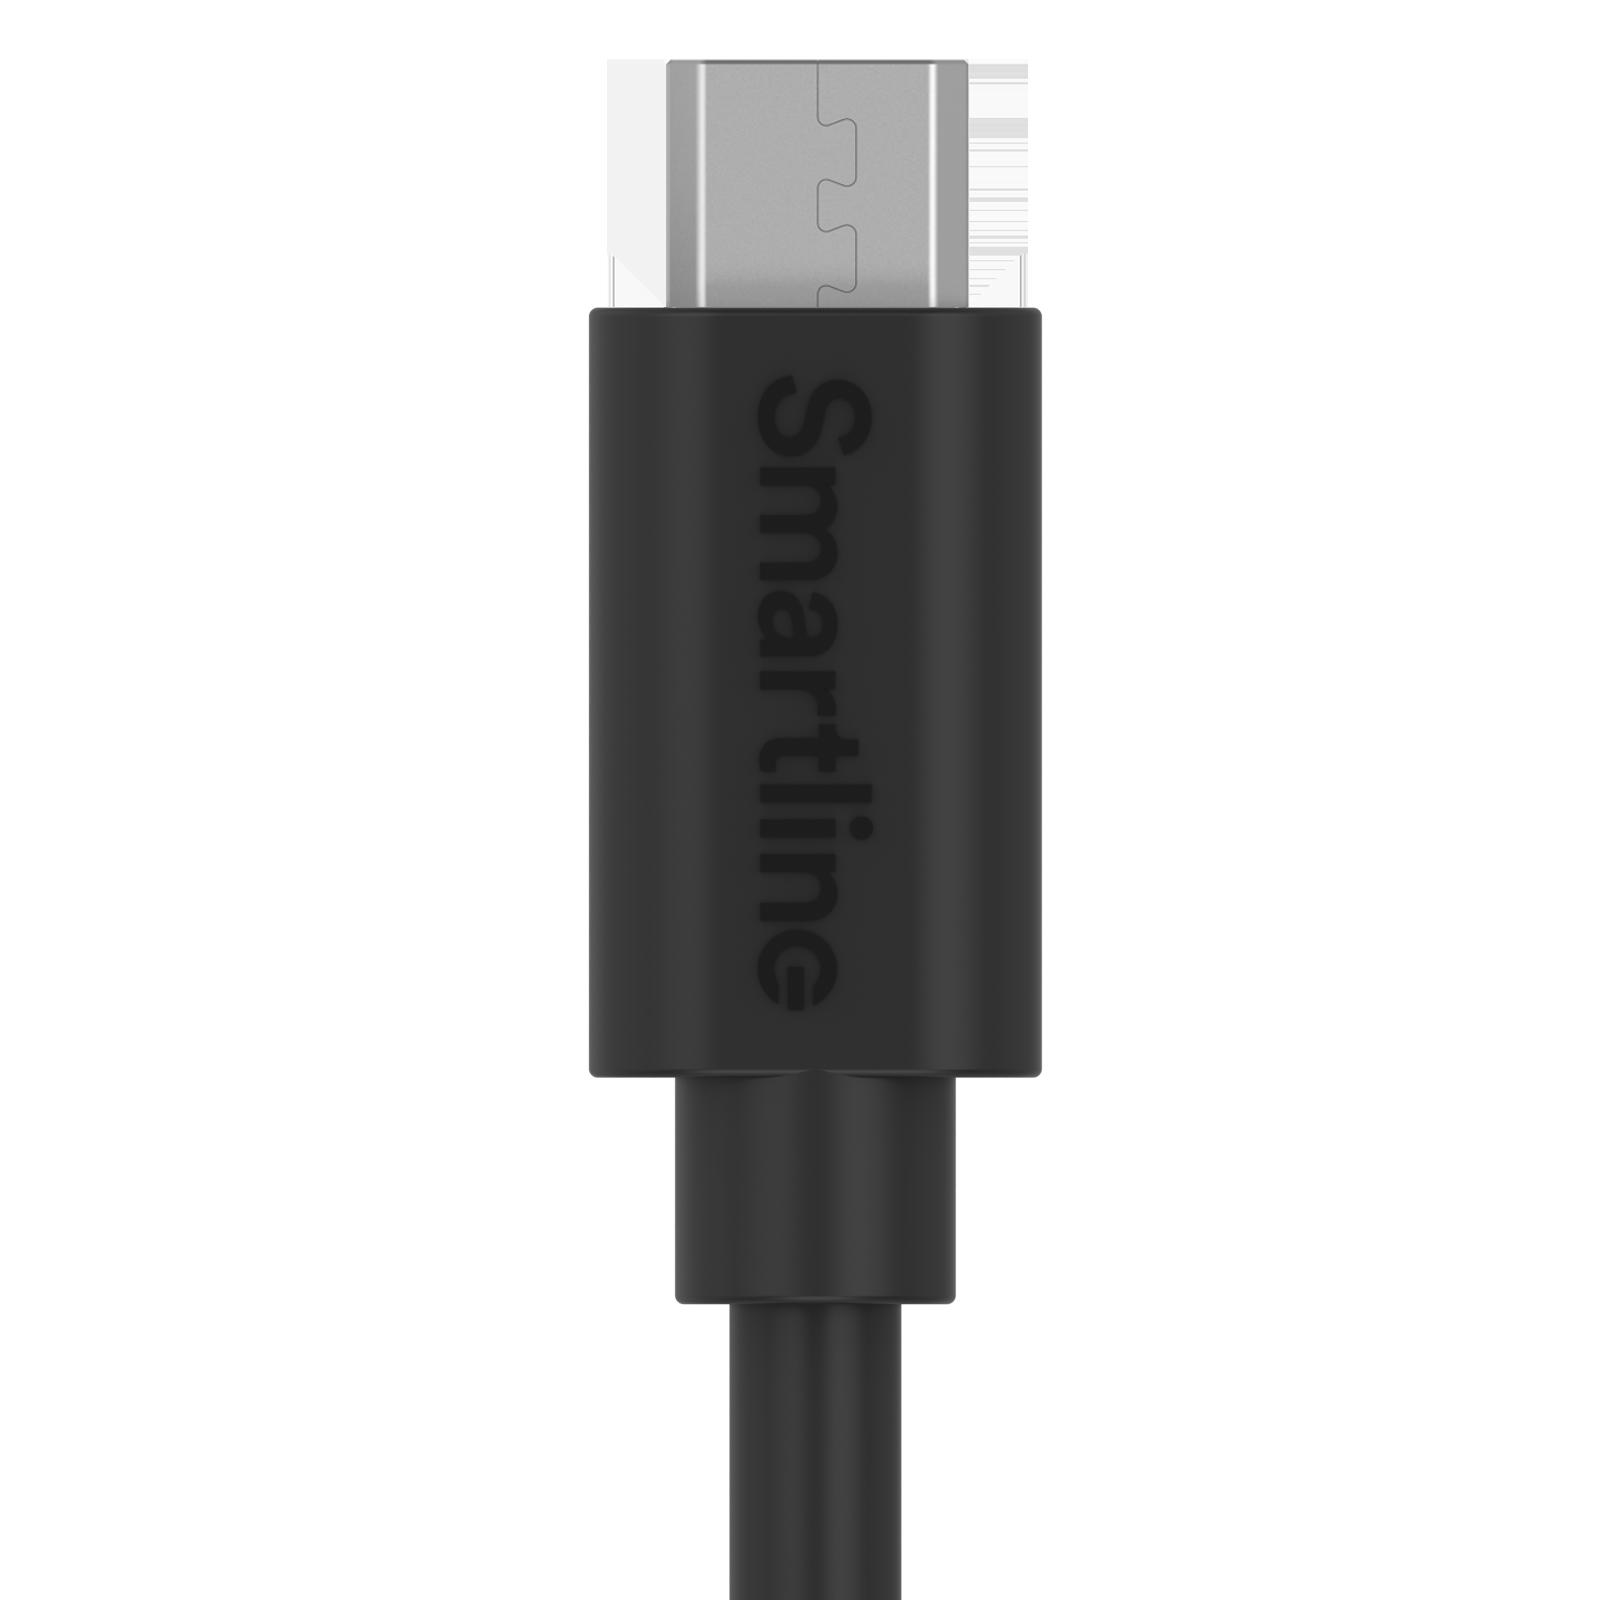 USB-kabel MicroUSB 2m Svart